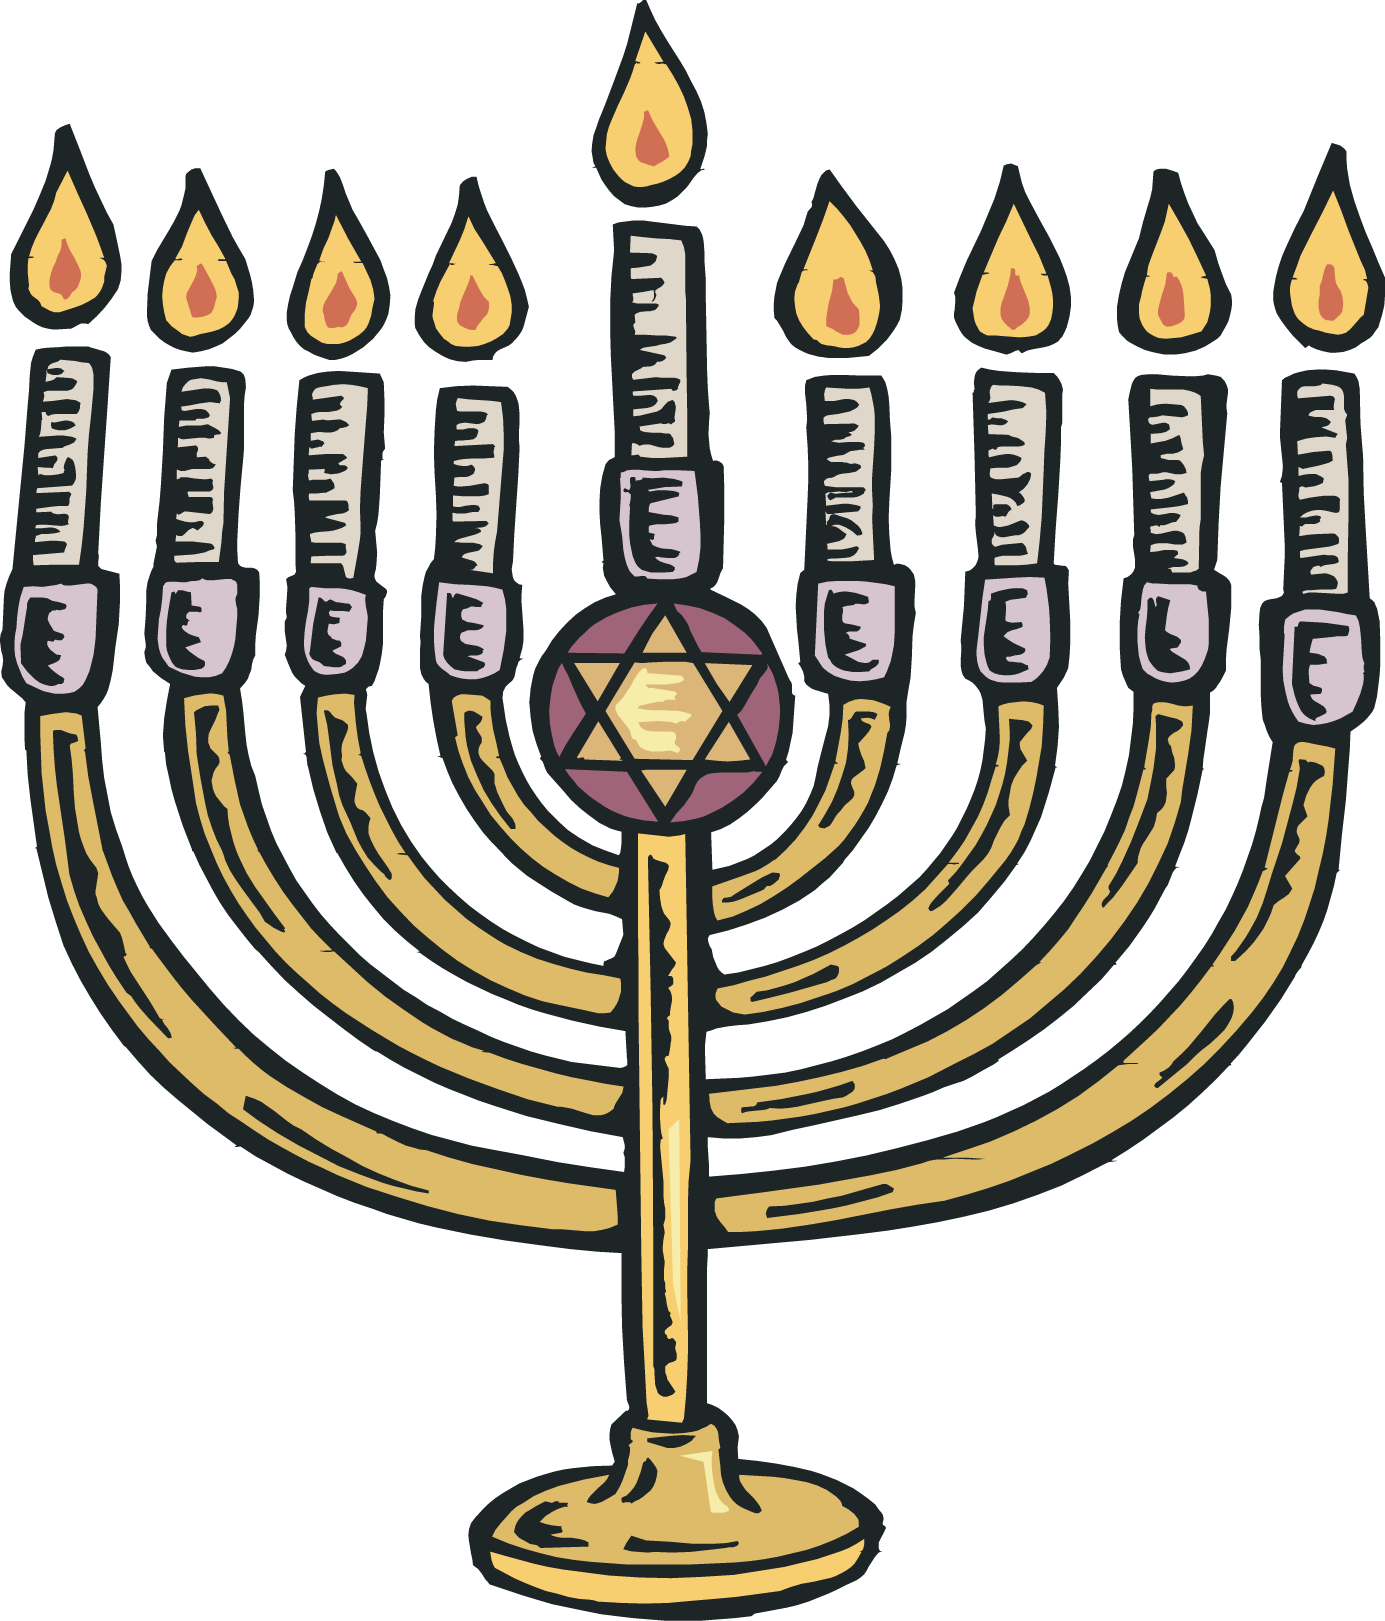 ... Hanukkah 20clipart - Free - Hanukkah Clip Art Images